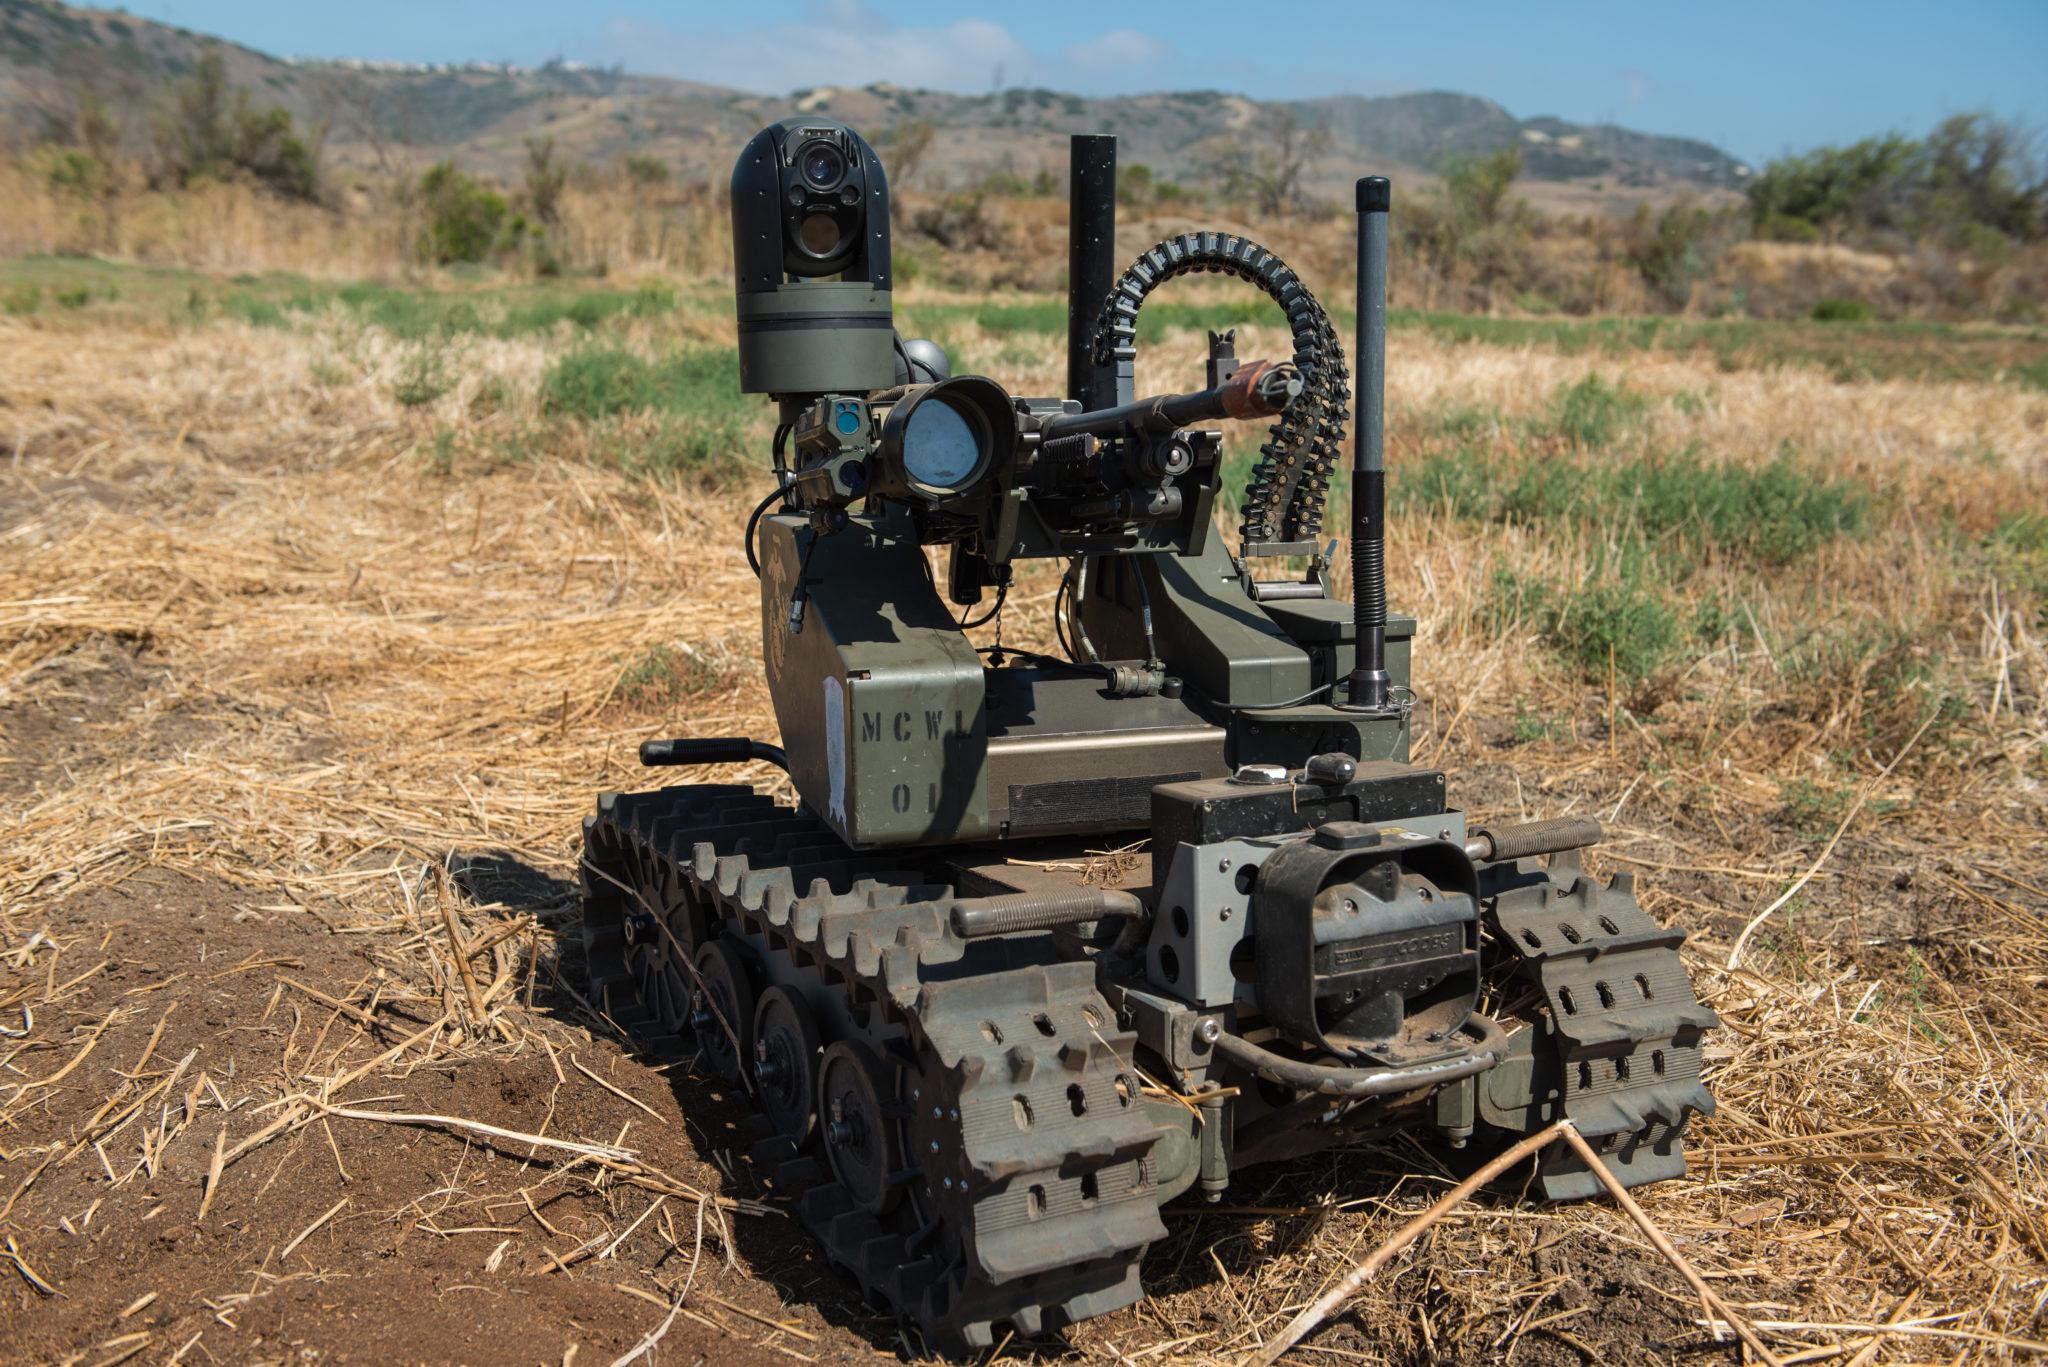 Das «Modular Advanced Armed Robotic System», kurz Maars. Ein Roboter, der ferngesteuert, aber auch eigenständig operieren kann.